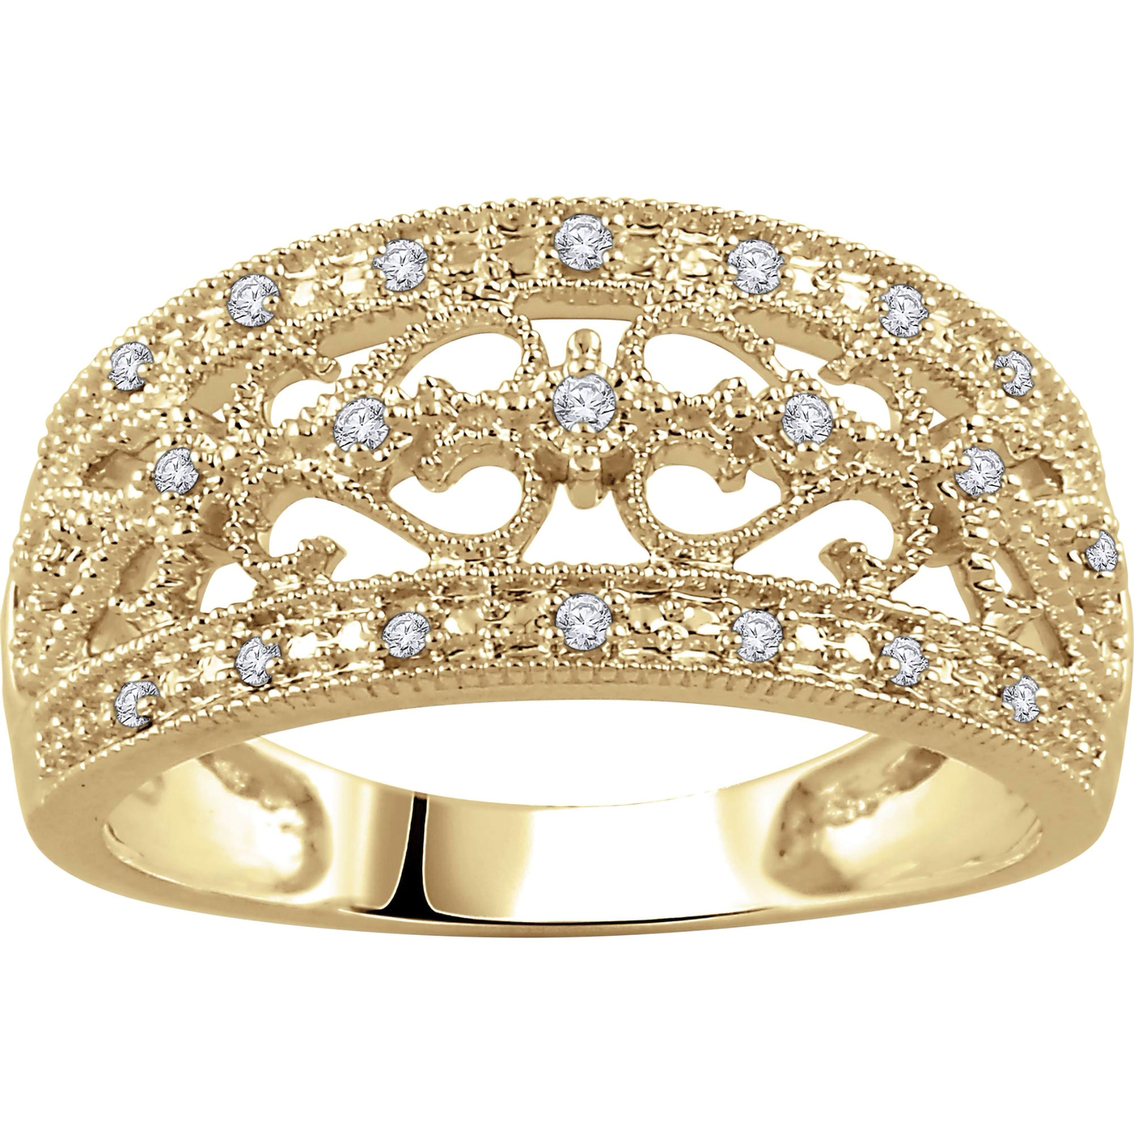 10k Yellow Gold 1 10 Ctw Tdw Diamond Anniversary Ring